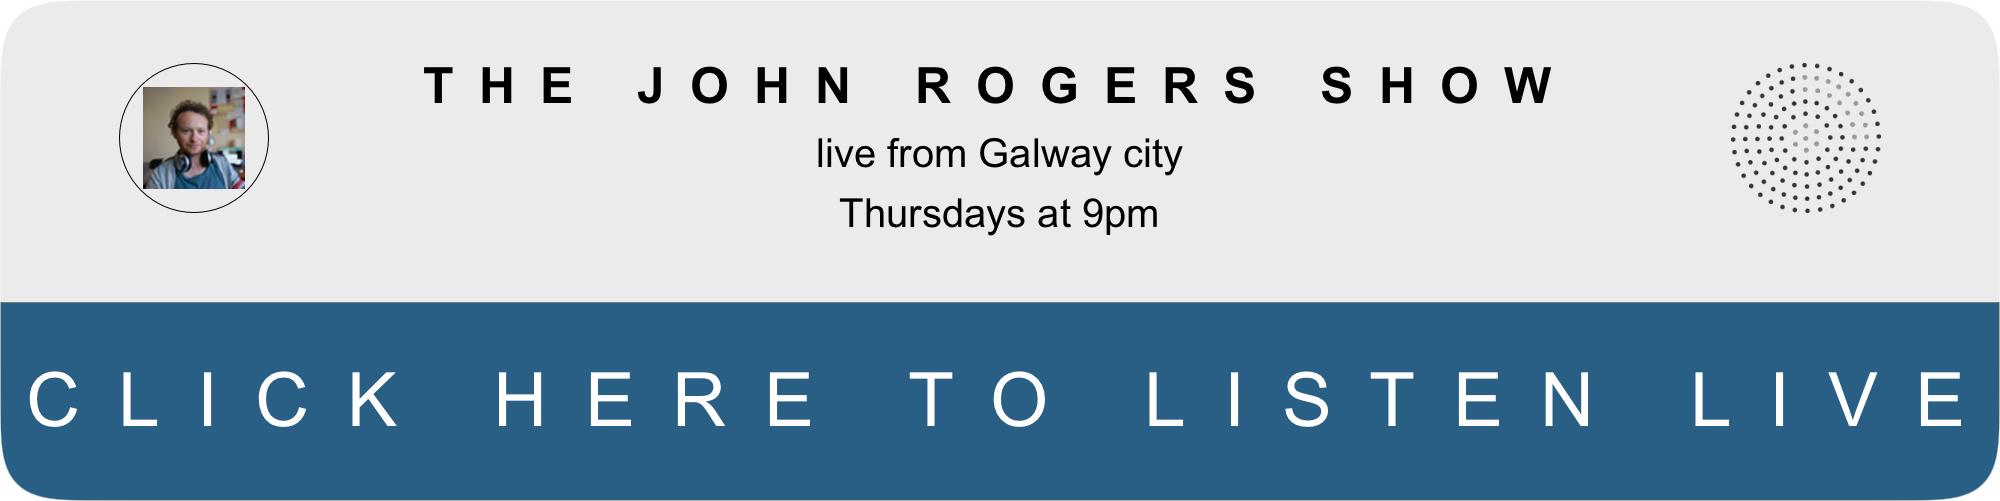 THE JOHN RROGERS SHOW, Listen live